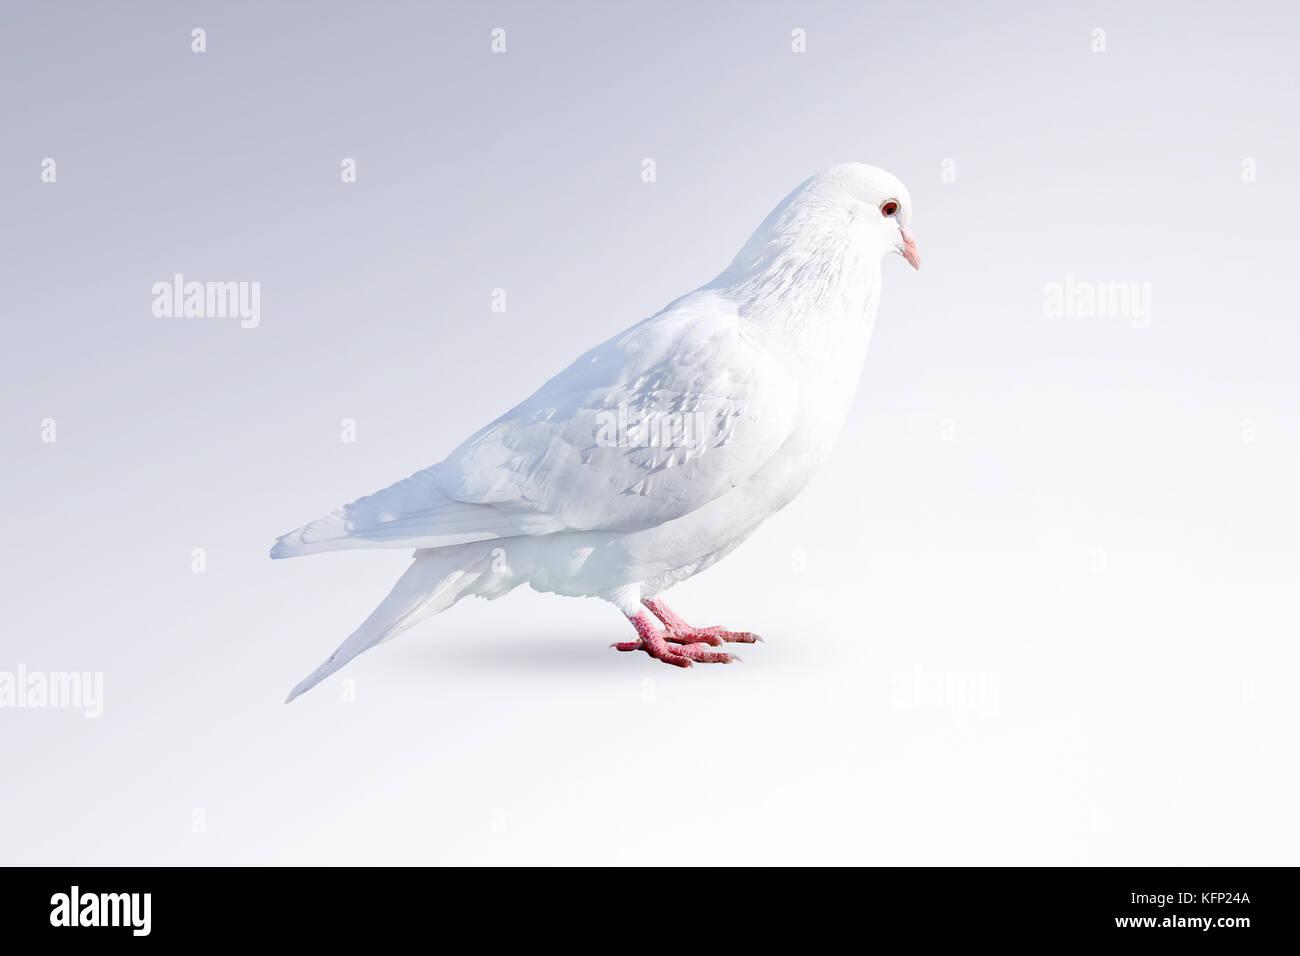 Religious Dove Stock Photos Amp Religious Dove Stock Images